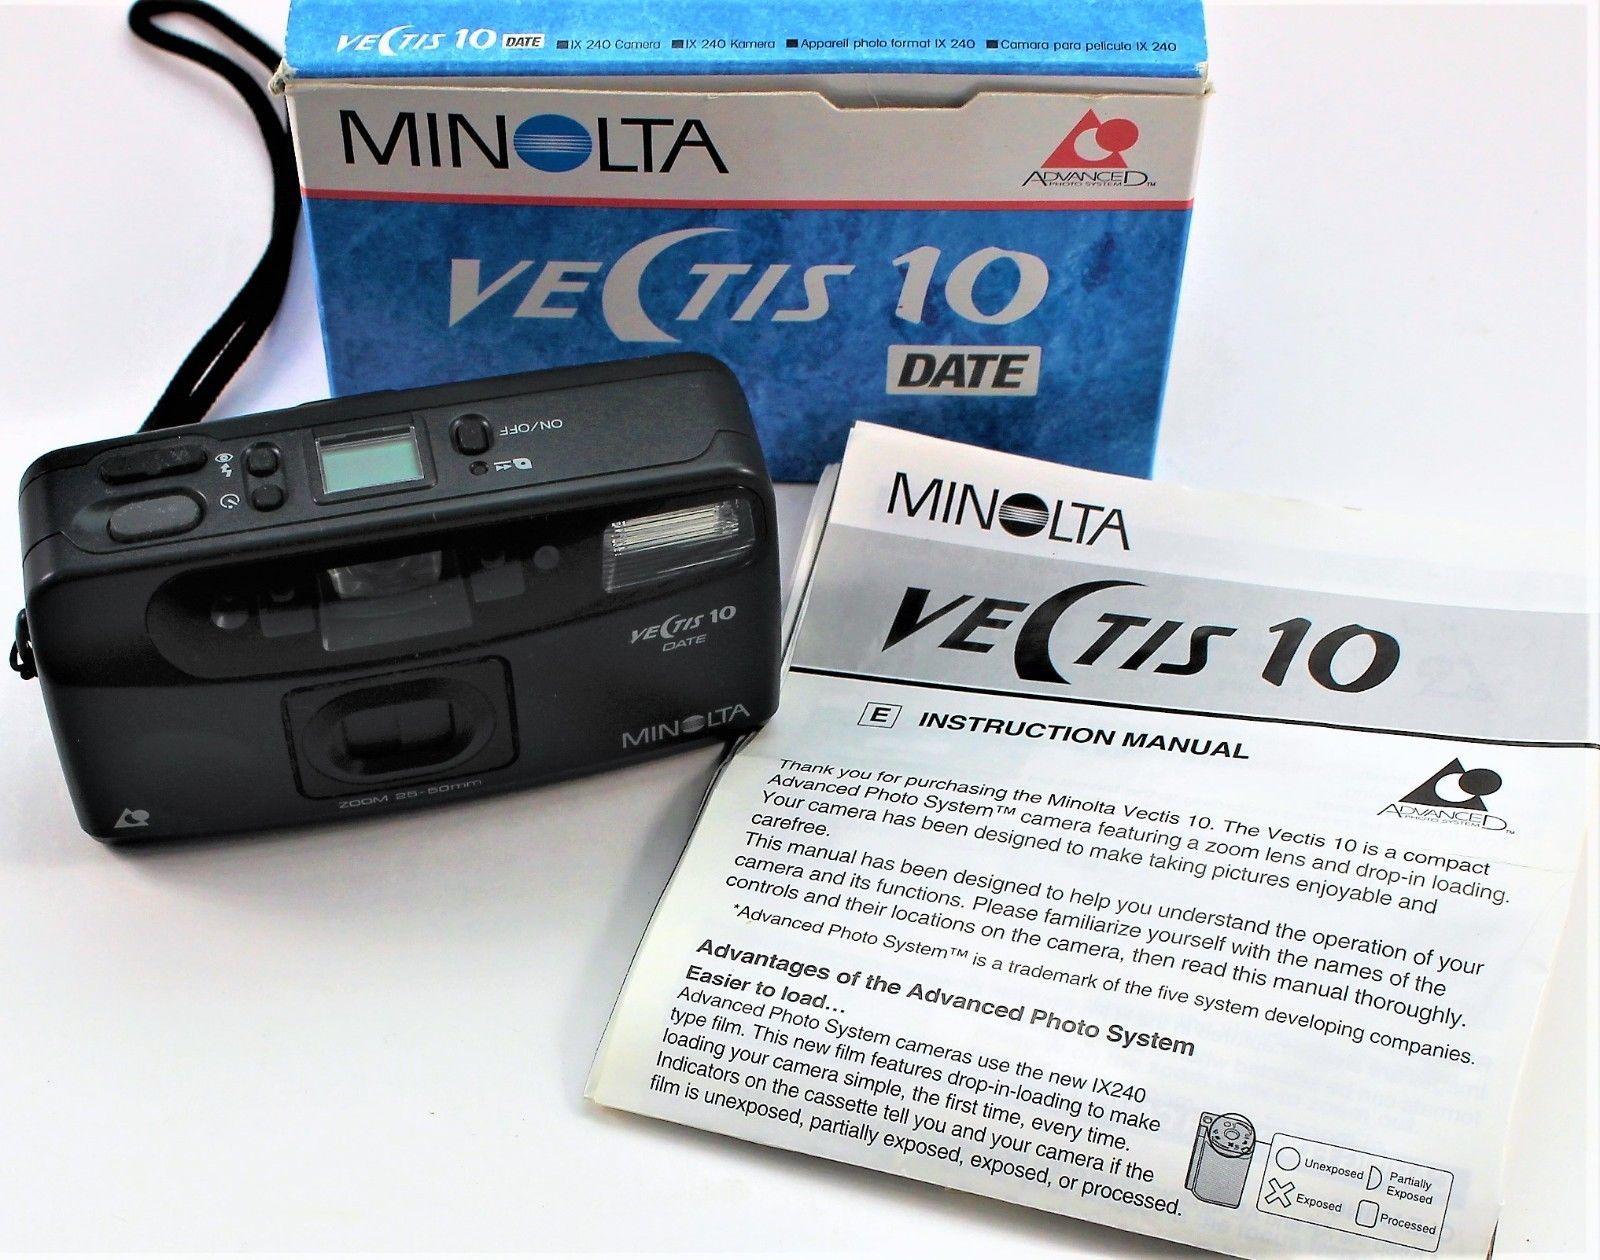 Vectis 10 Date Camera by Minolta